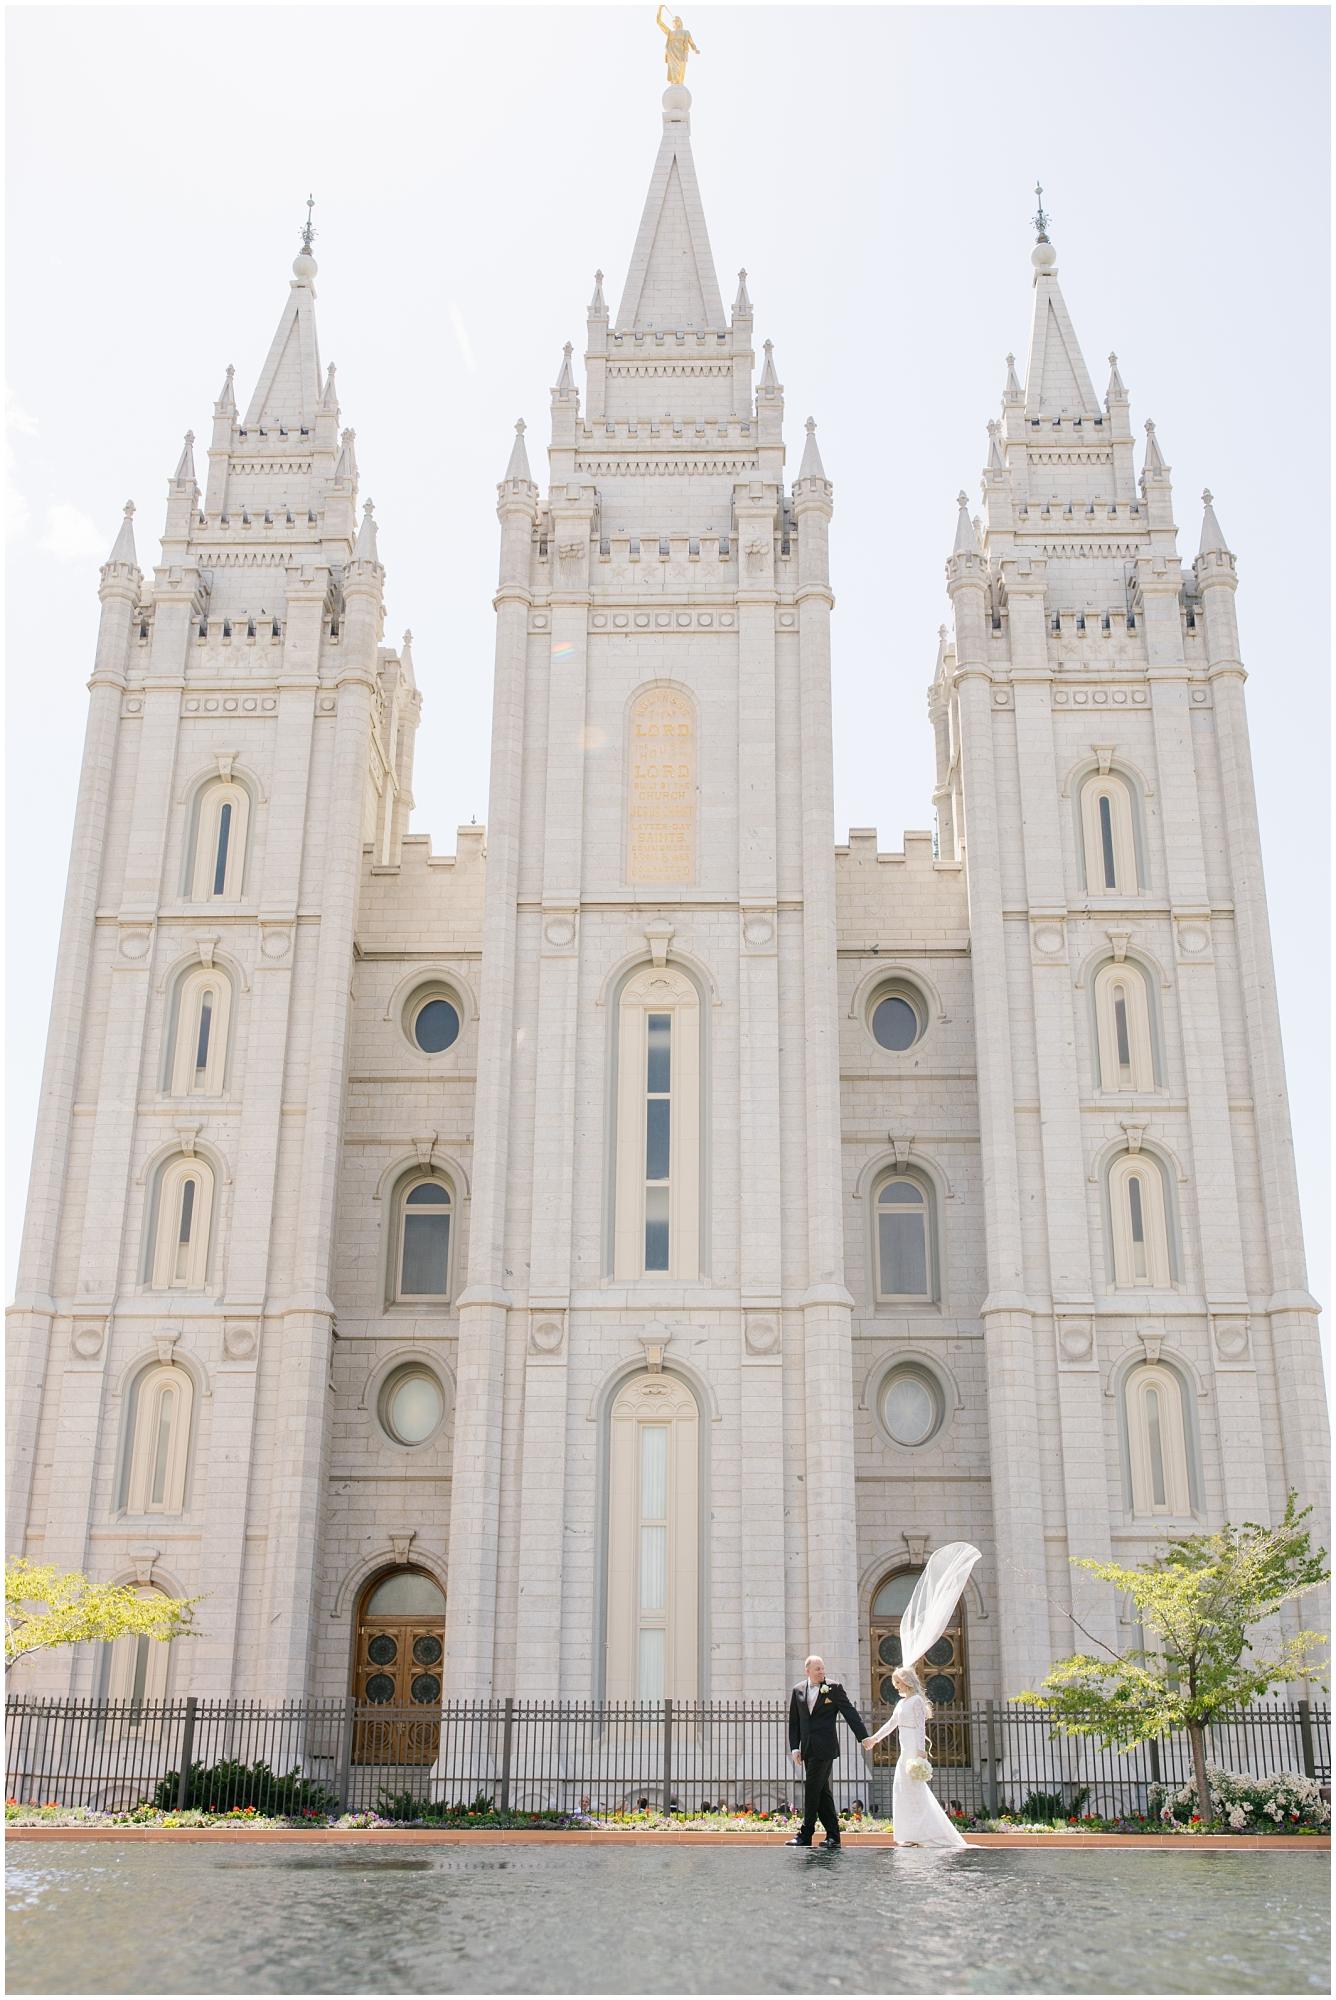 CherylandTyler-237_Lizzie-B-Imagery-Utah-Wedding-Photographer-Park-City-Salt-Lake-City-Temple-Wells-Fargo-Building.jpg